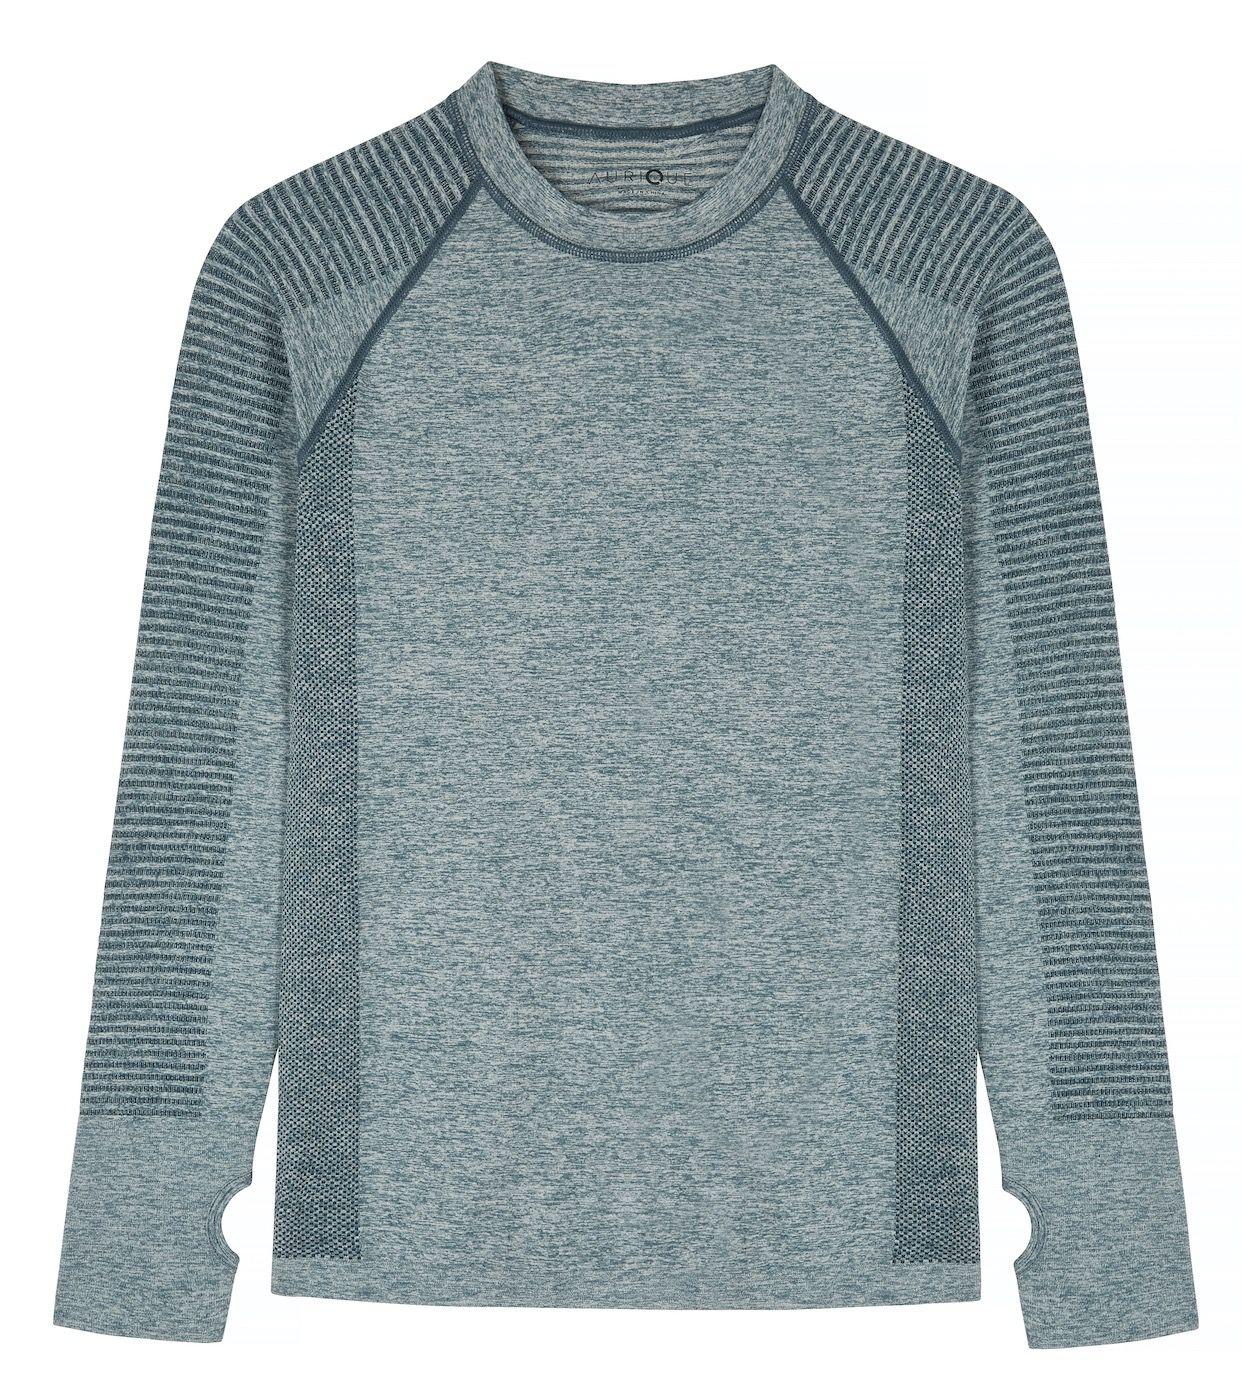 AURIQUE Womens Seamless Mesh Long Sleeve Sports Top Brand